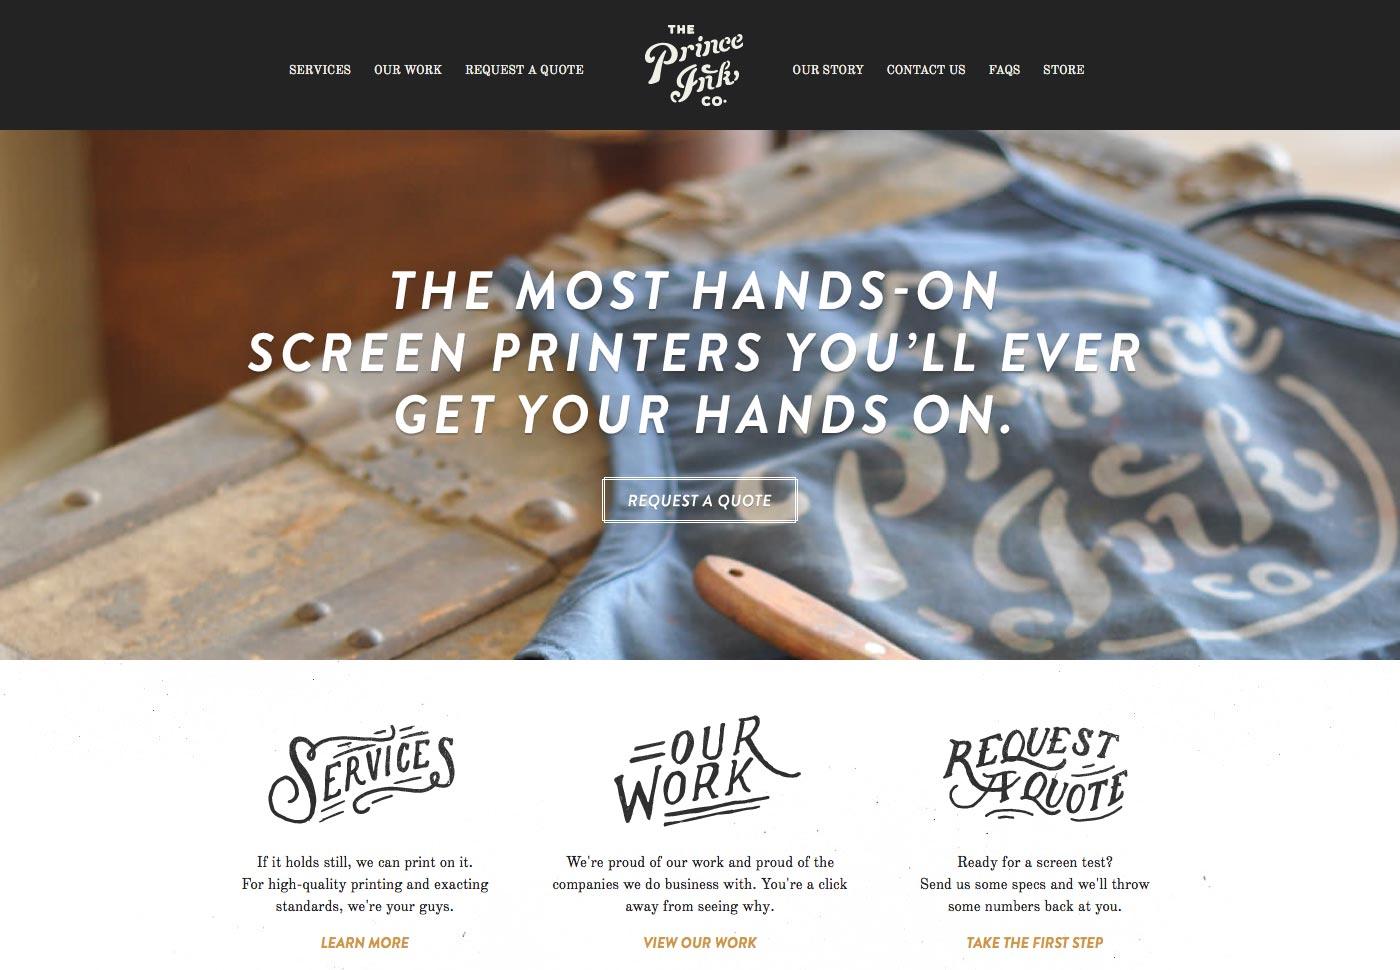 The Prince Ink Company